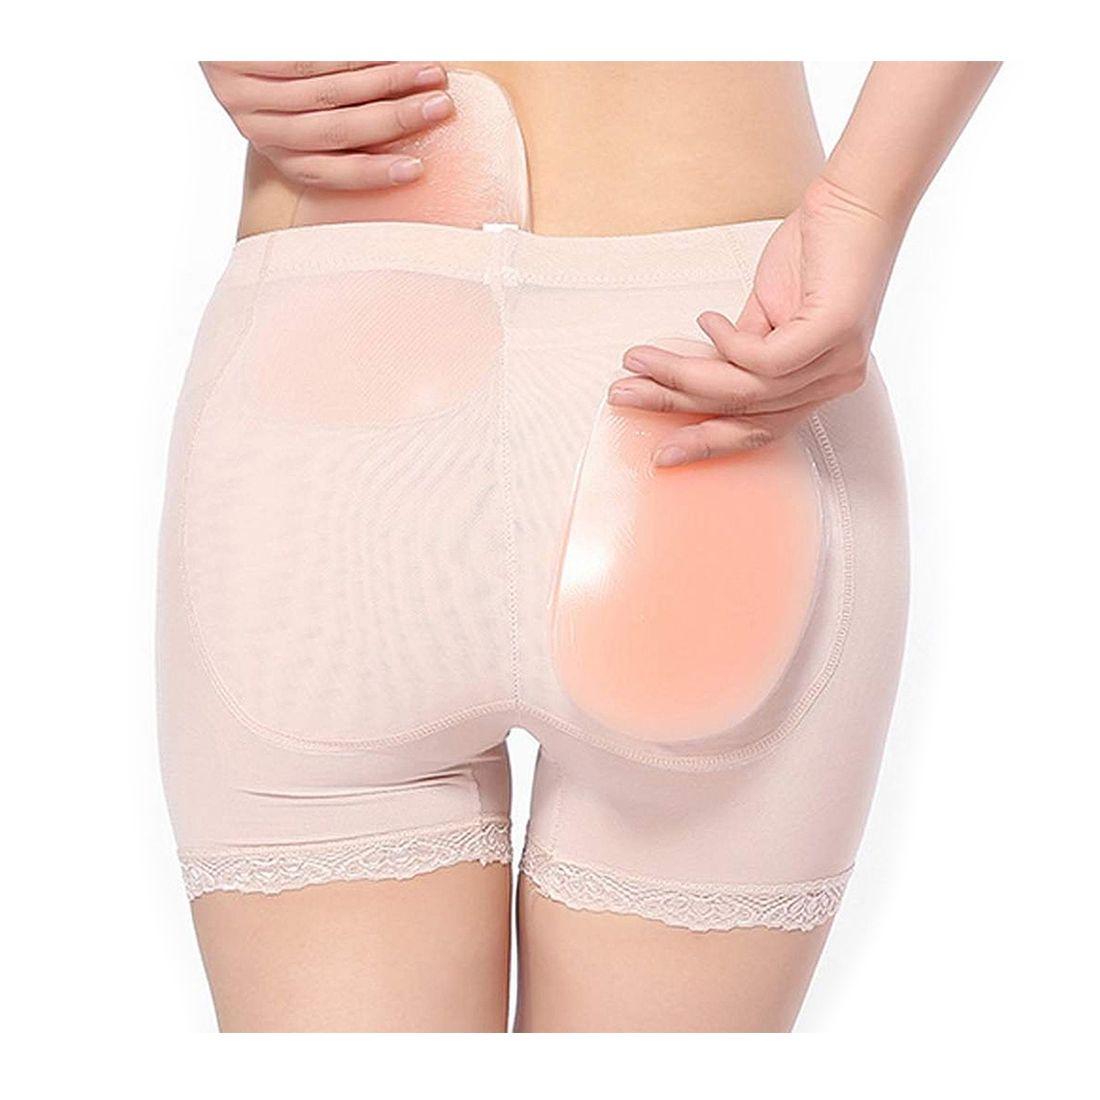 Hot Women Sexy beige Silicone Hip Up Pads Butt Enhancer Booster